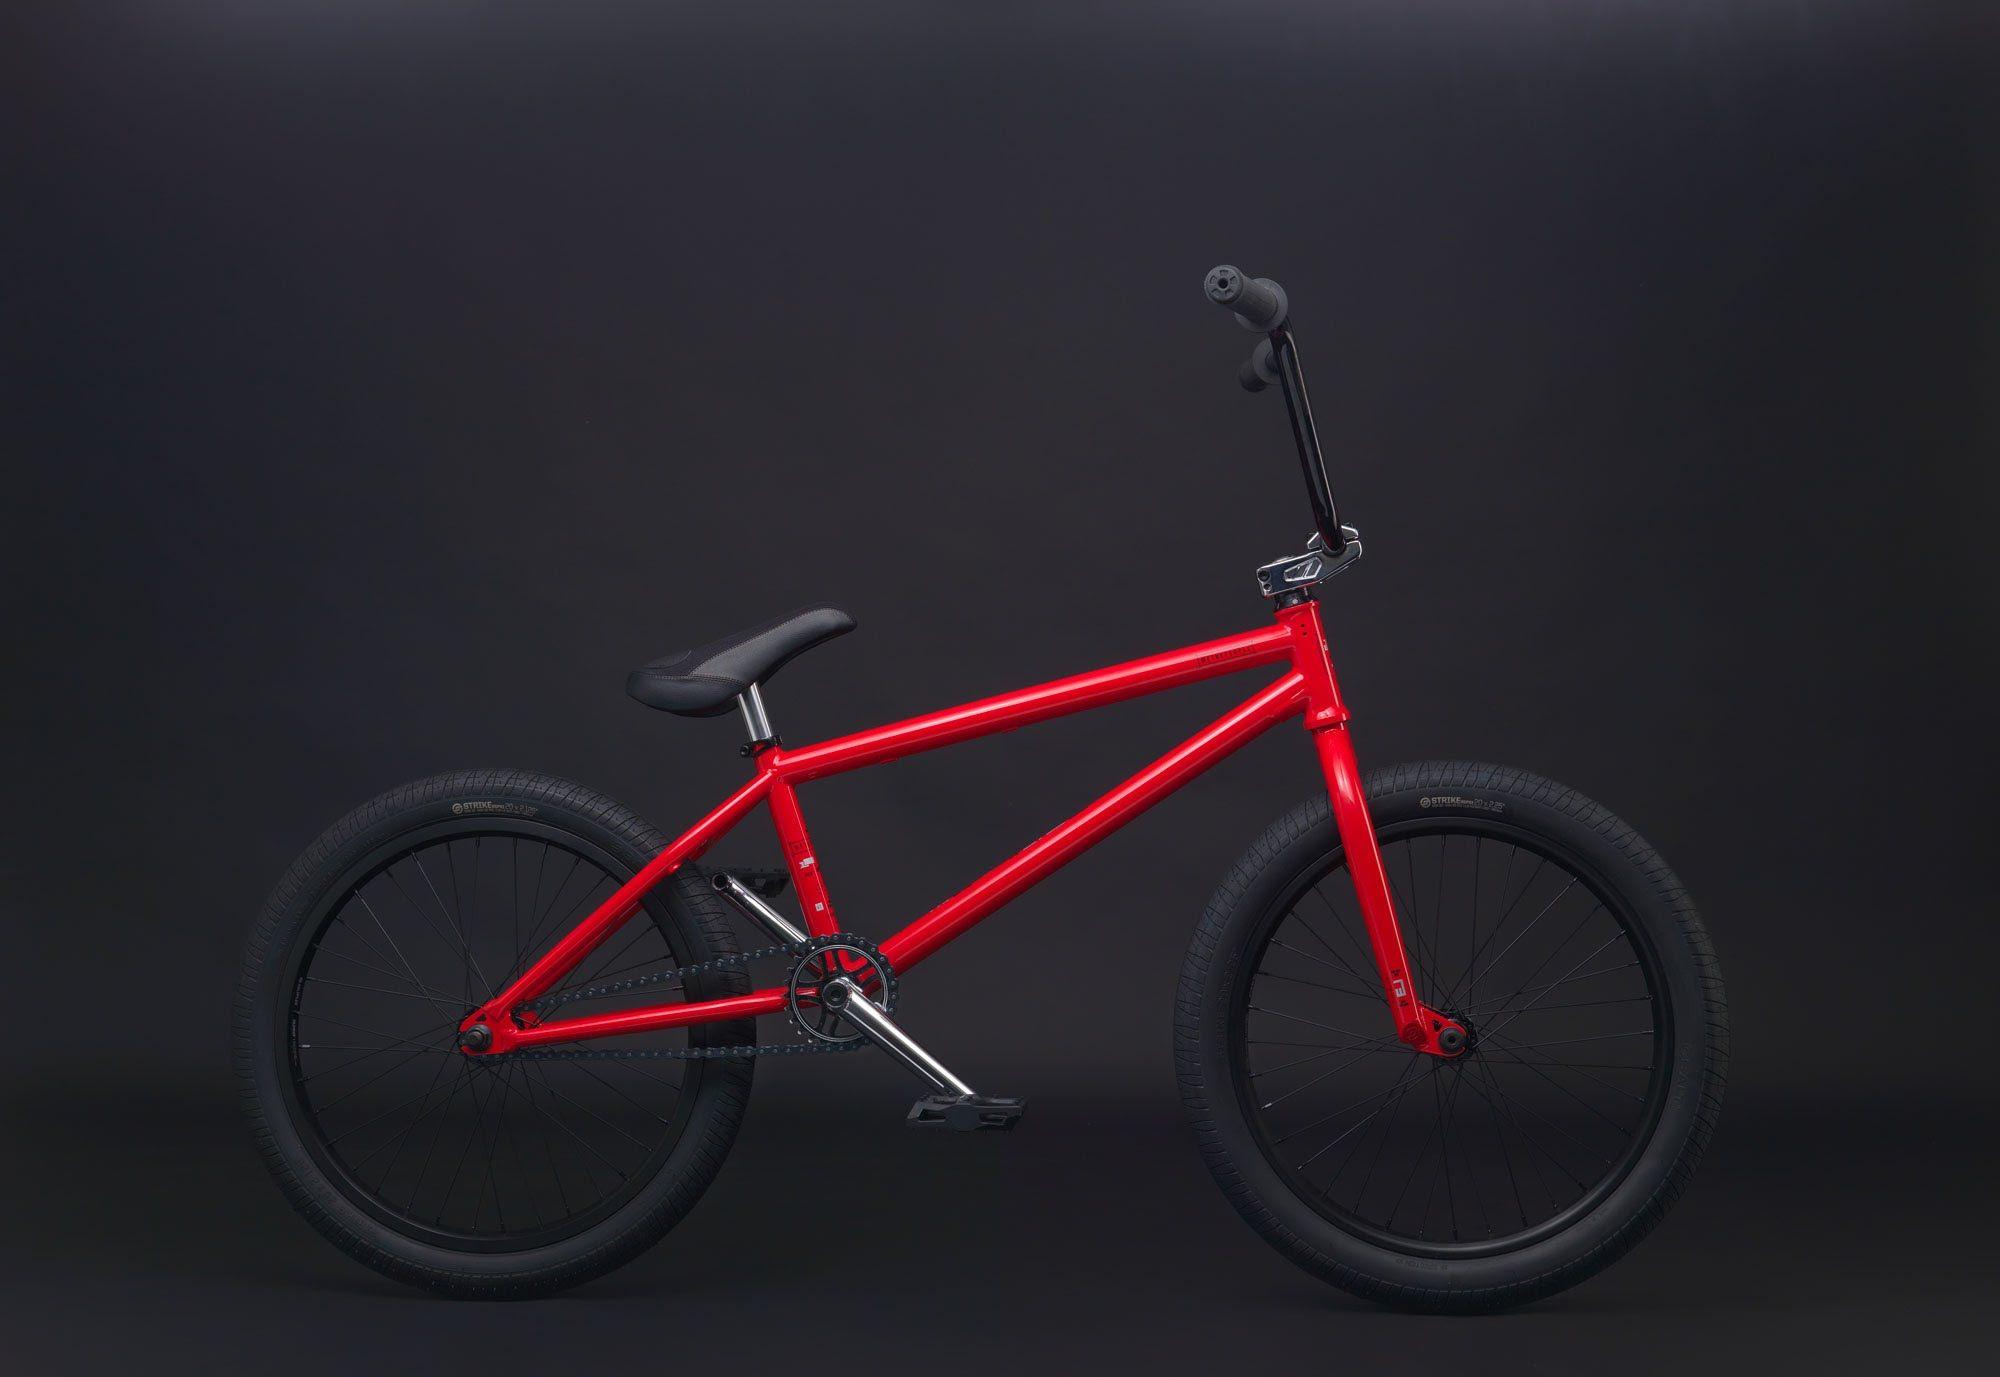 2015 Wethepeople Complete Bike The Justice Bmx Bikes Bmx Mountain Bike Vintage Bmx Bikes